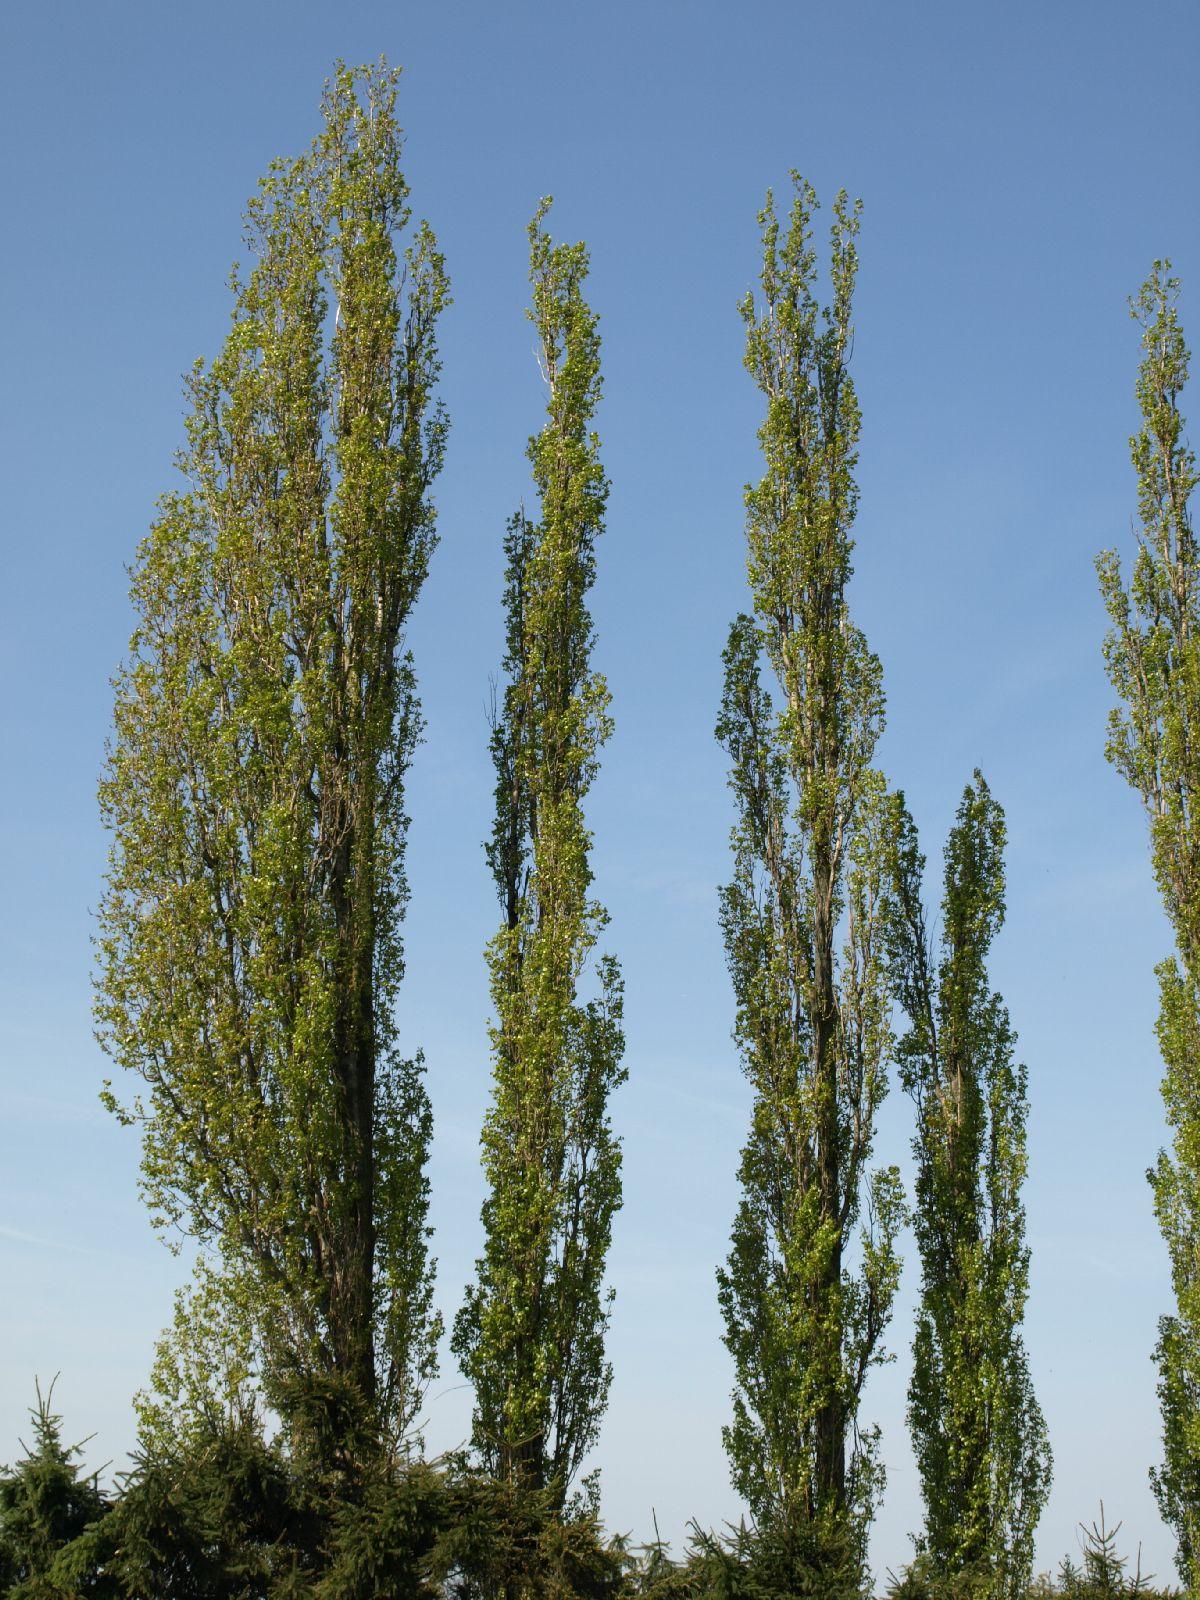 Pflanzen-Baum-Foto_Textur_B_P5042417